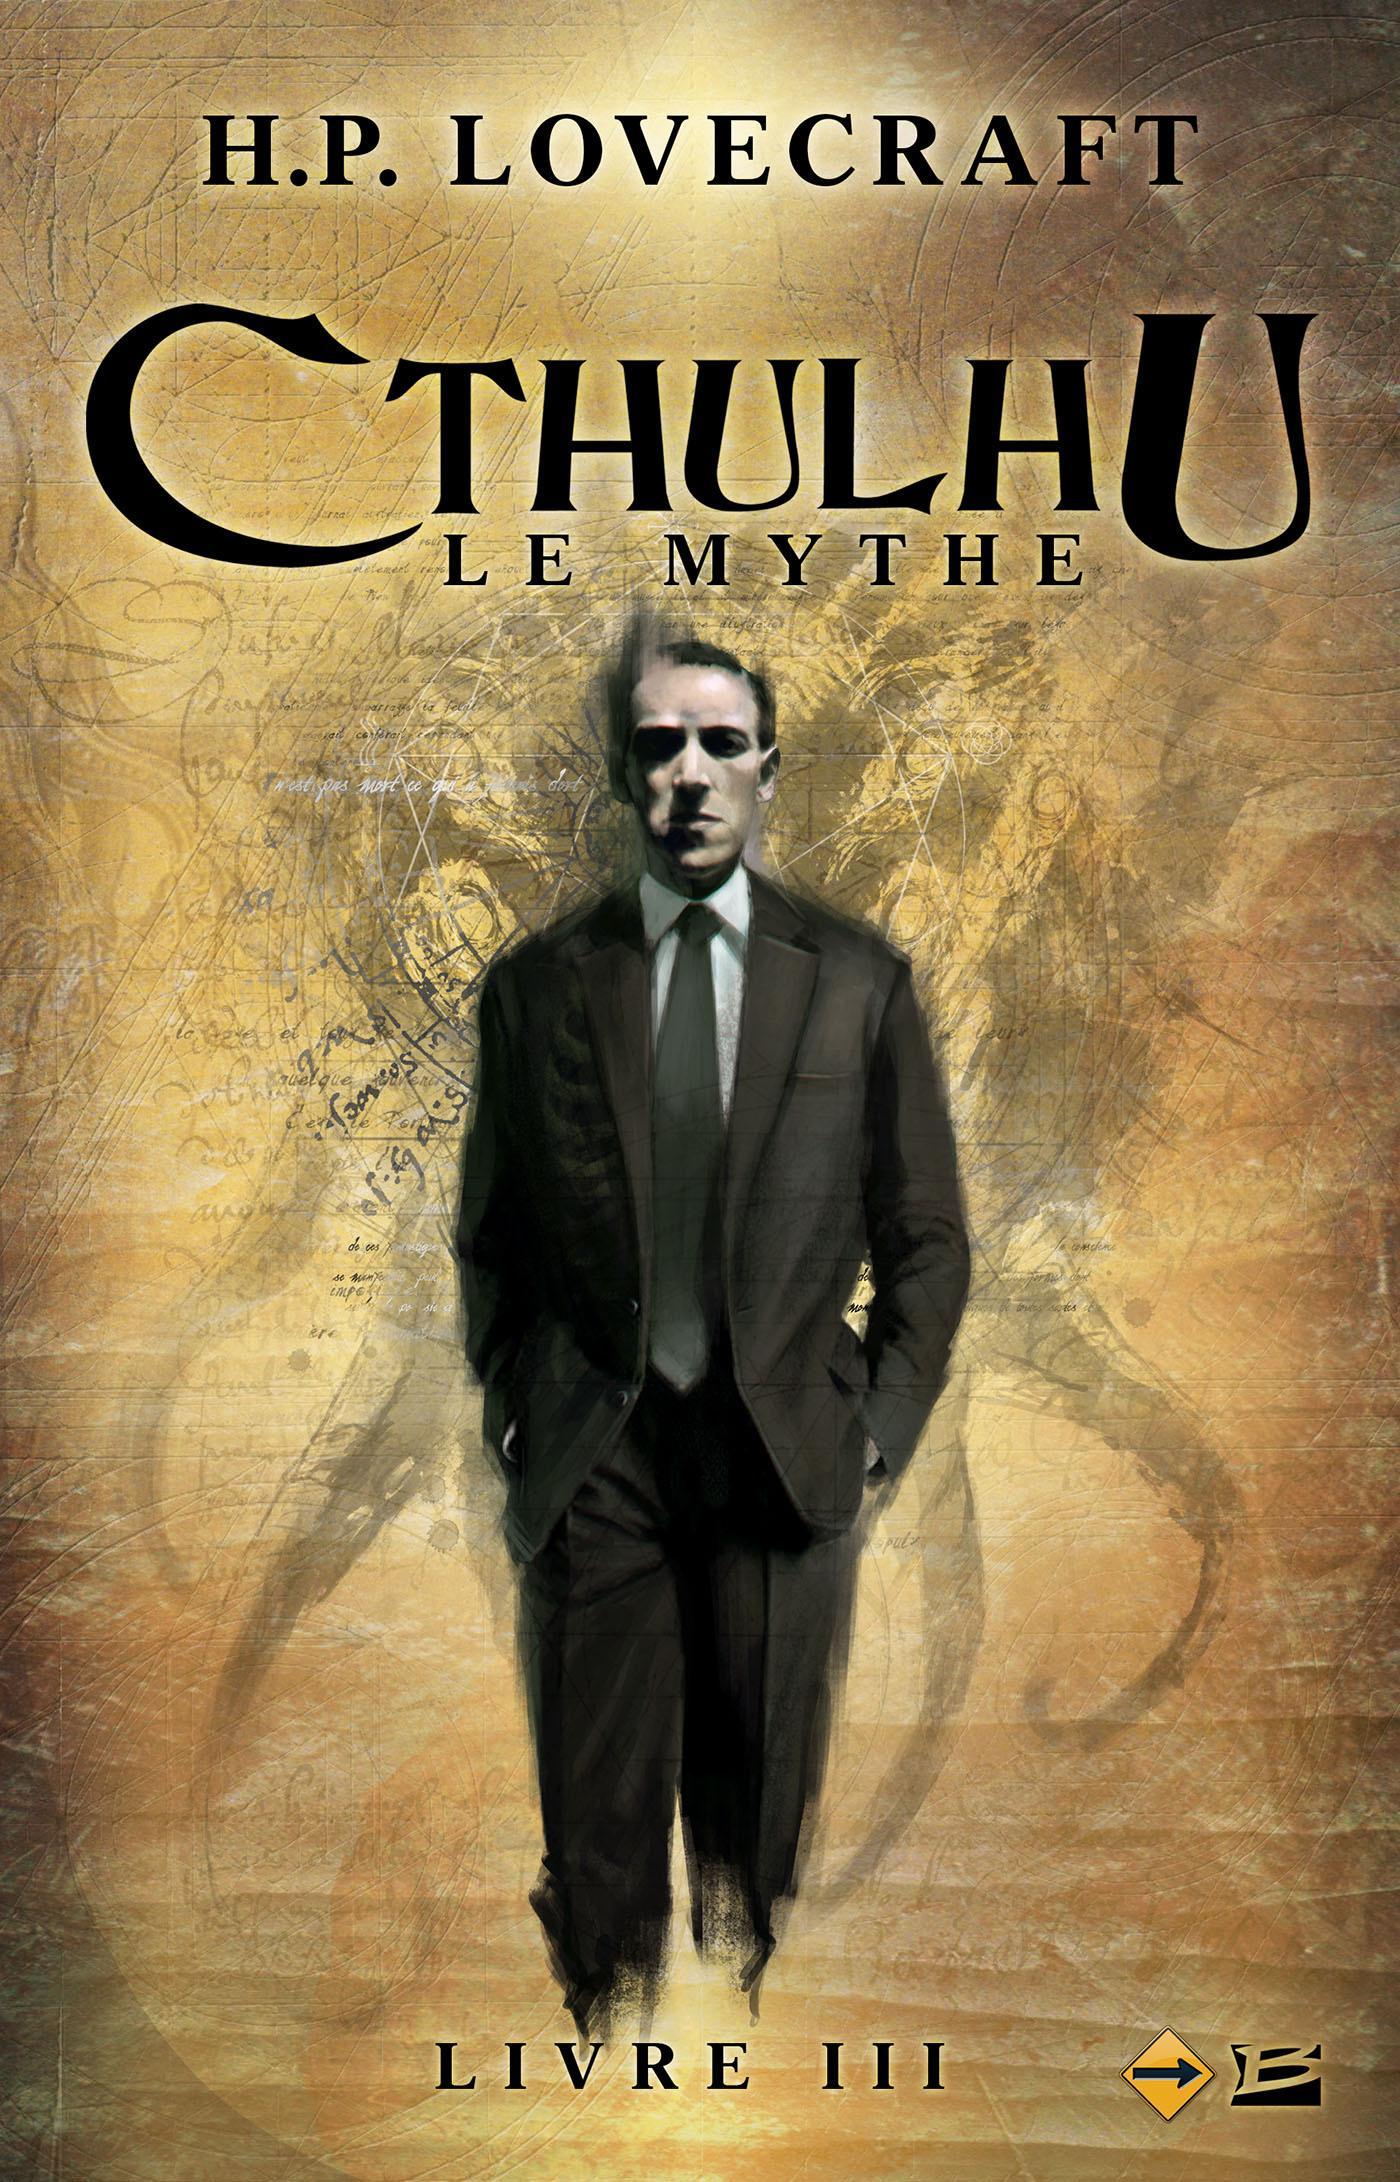 Cthulhu : Le Mythe, Livre 3, CTHULHU, T3